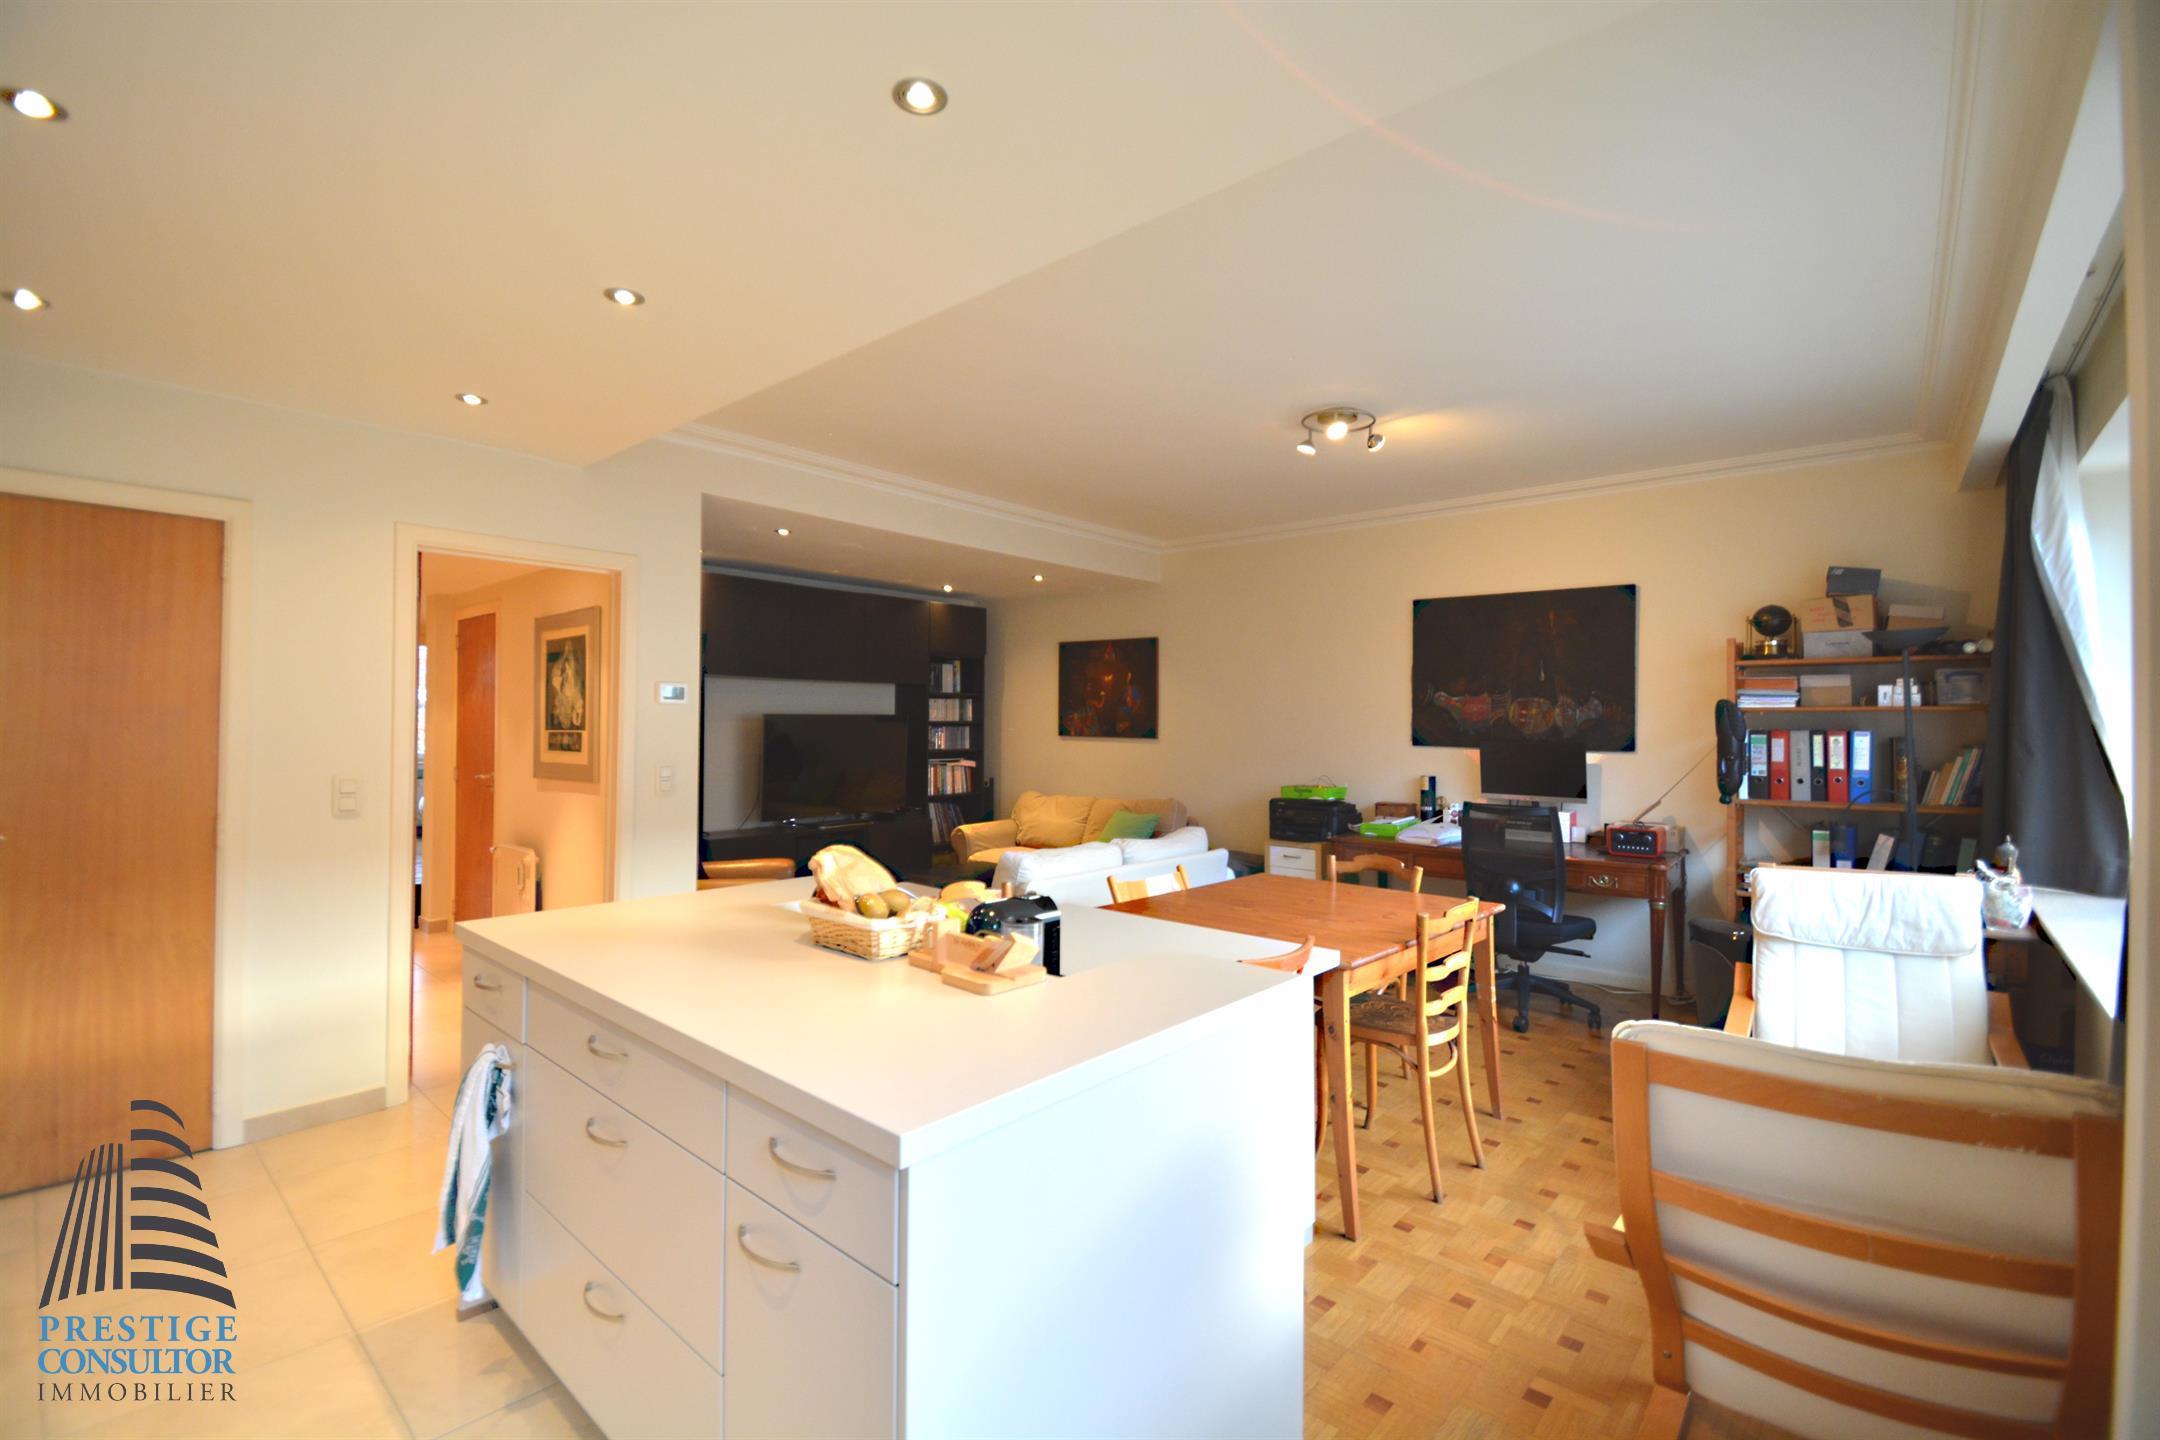 Appartement - Woluwe-Saint-Lambert - #3960211-0